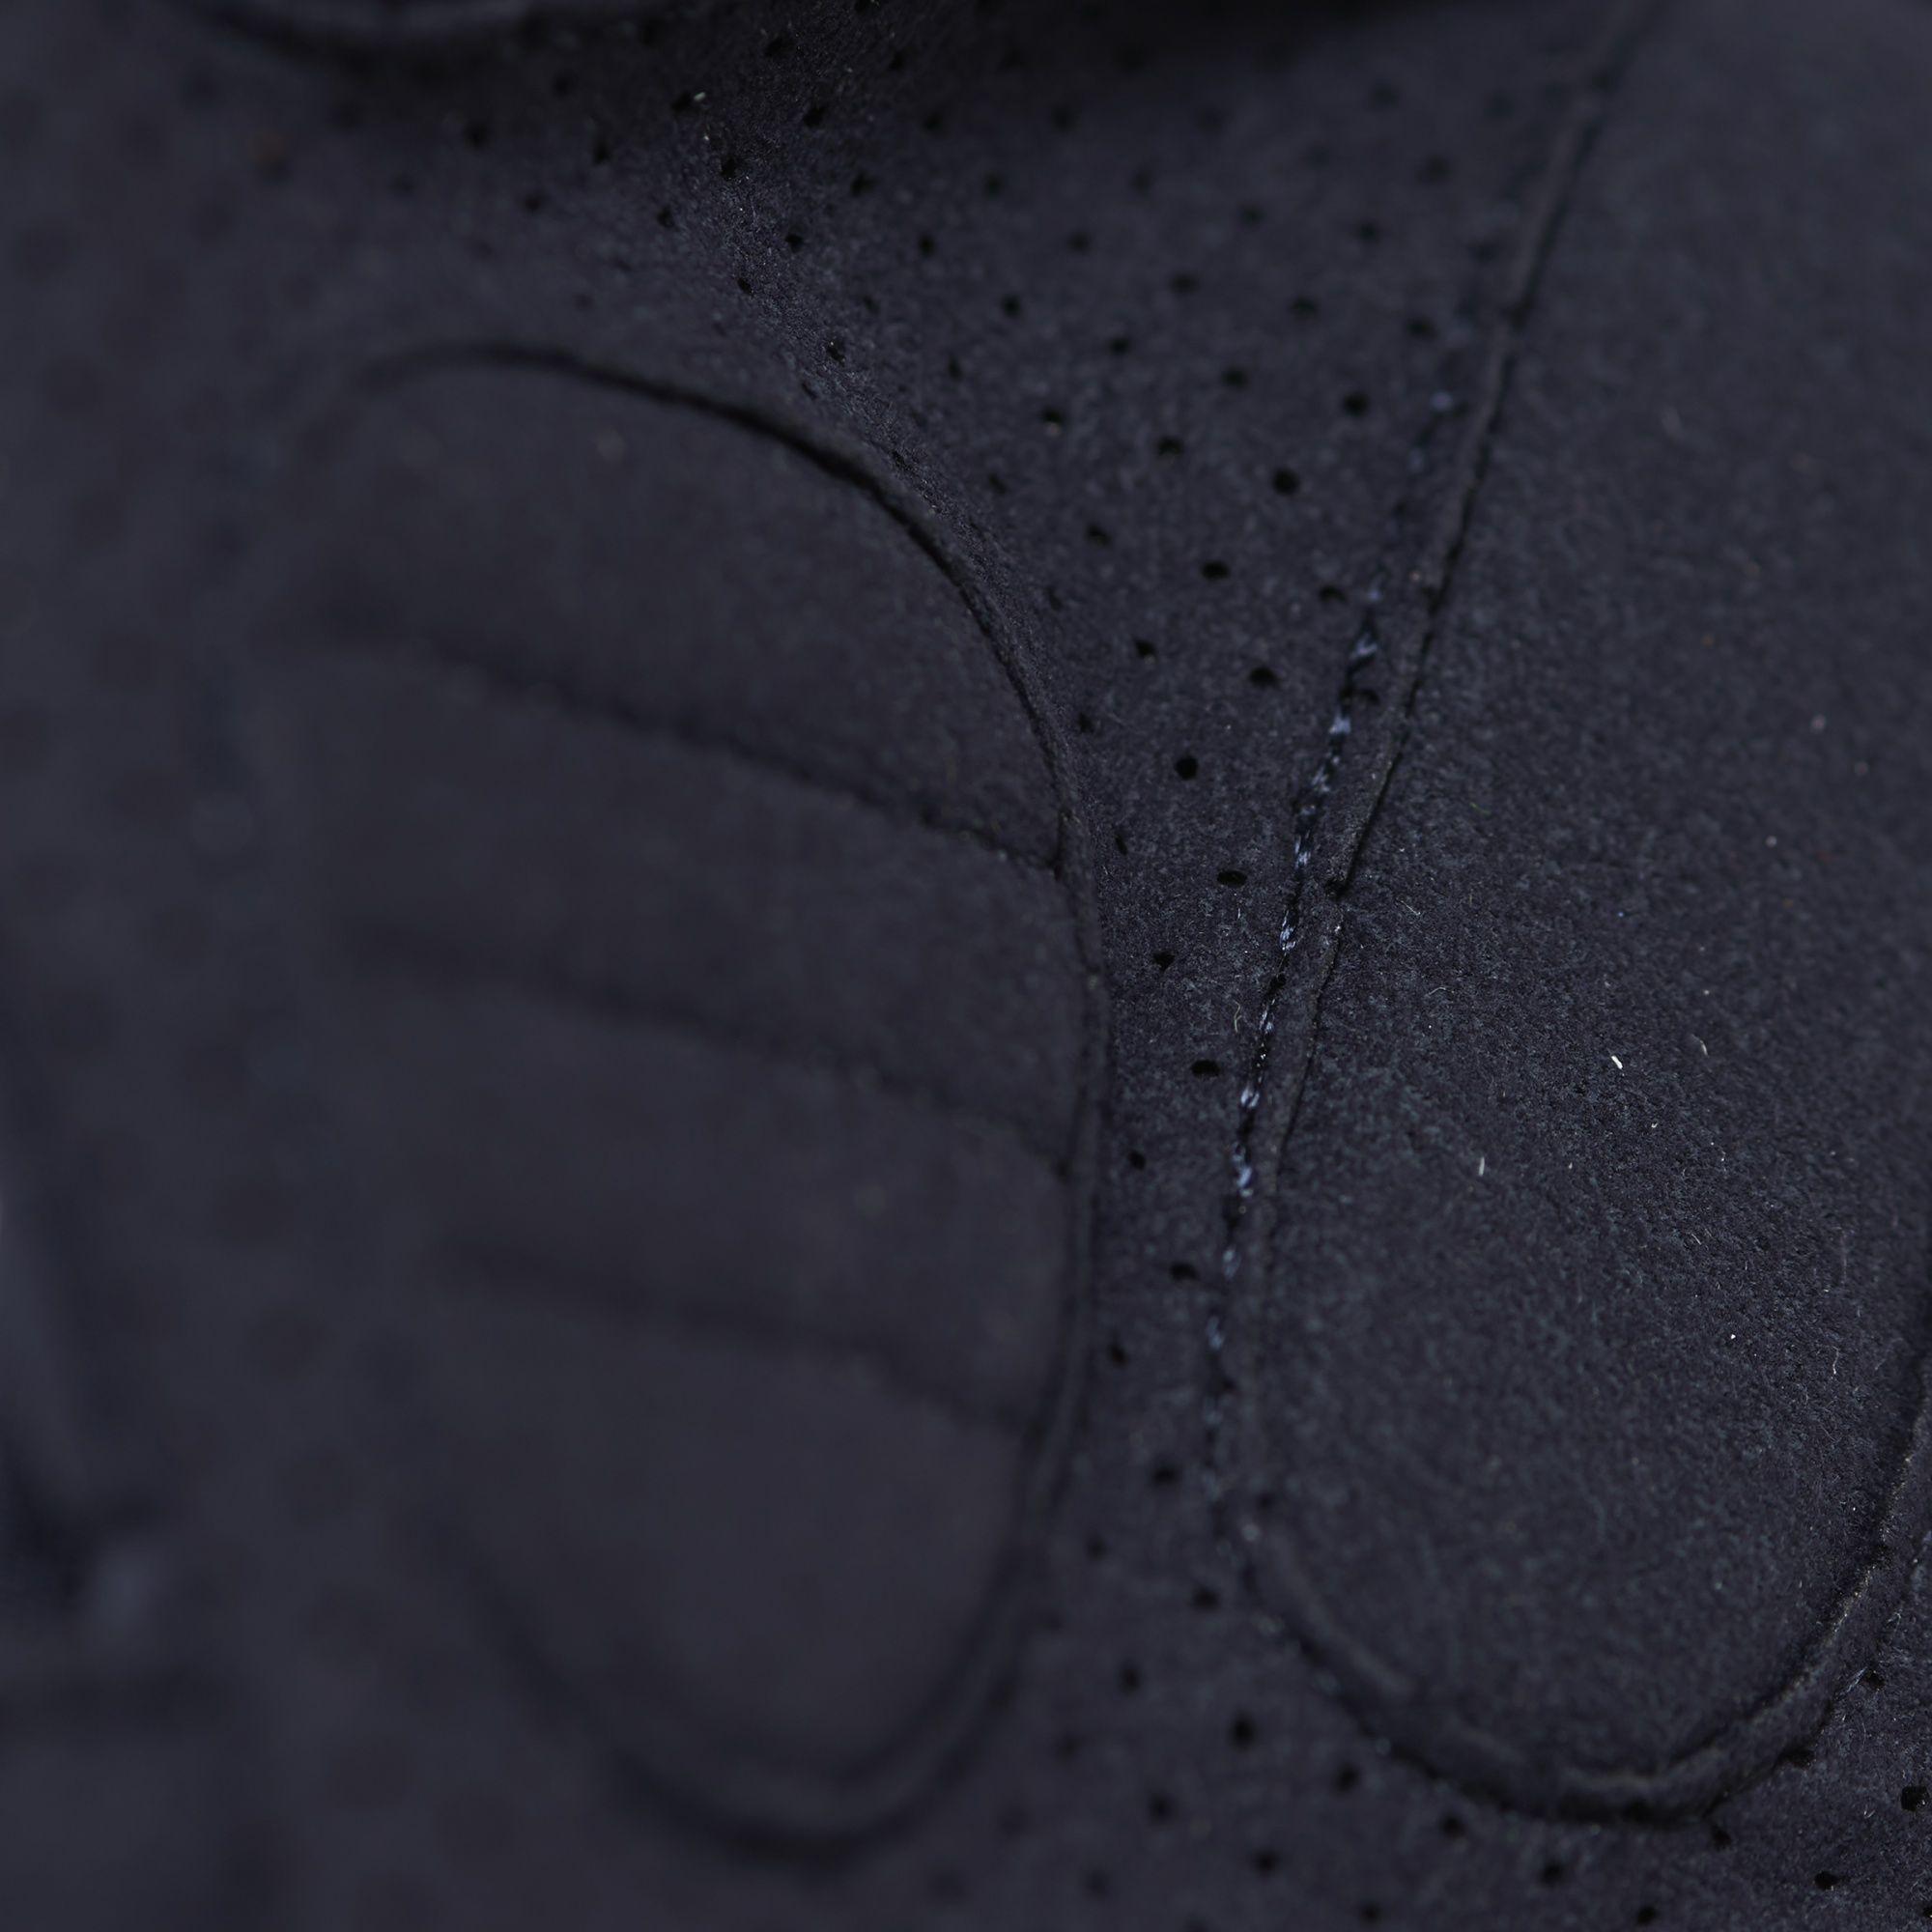 Blue Gym Gloves Women's Adidas Originals Gloves Cosmic Confessions Rita Ora